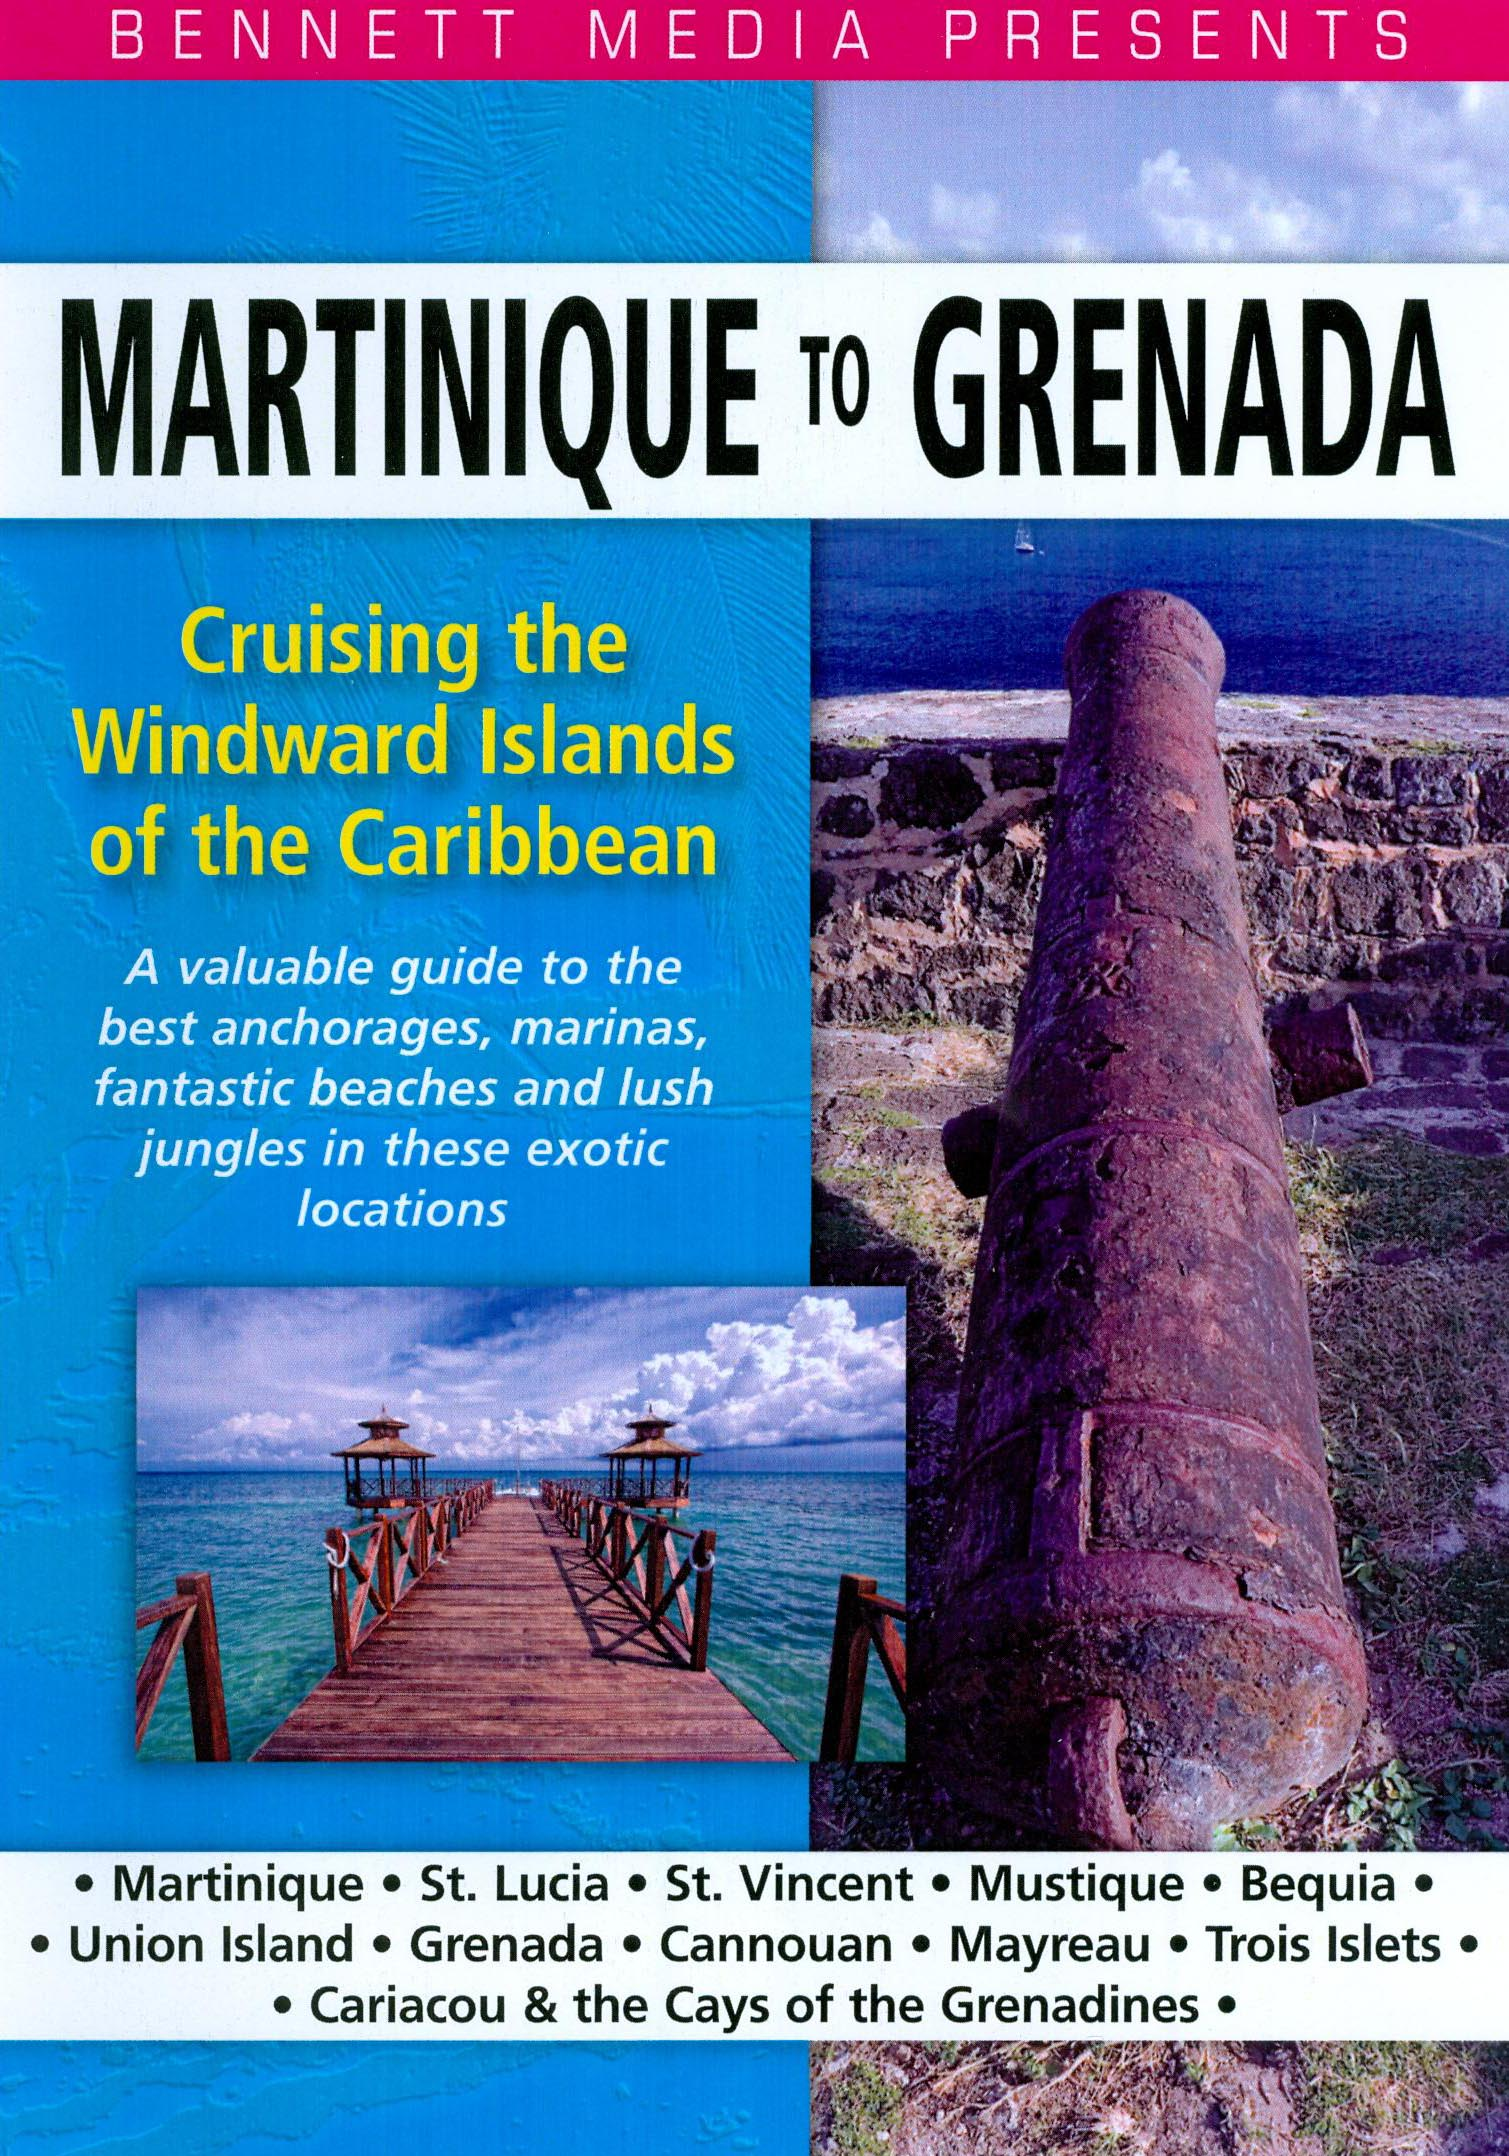 Video Voyages: Cruising the Windward Islands